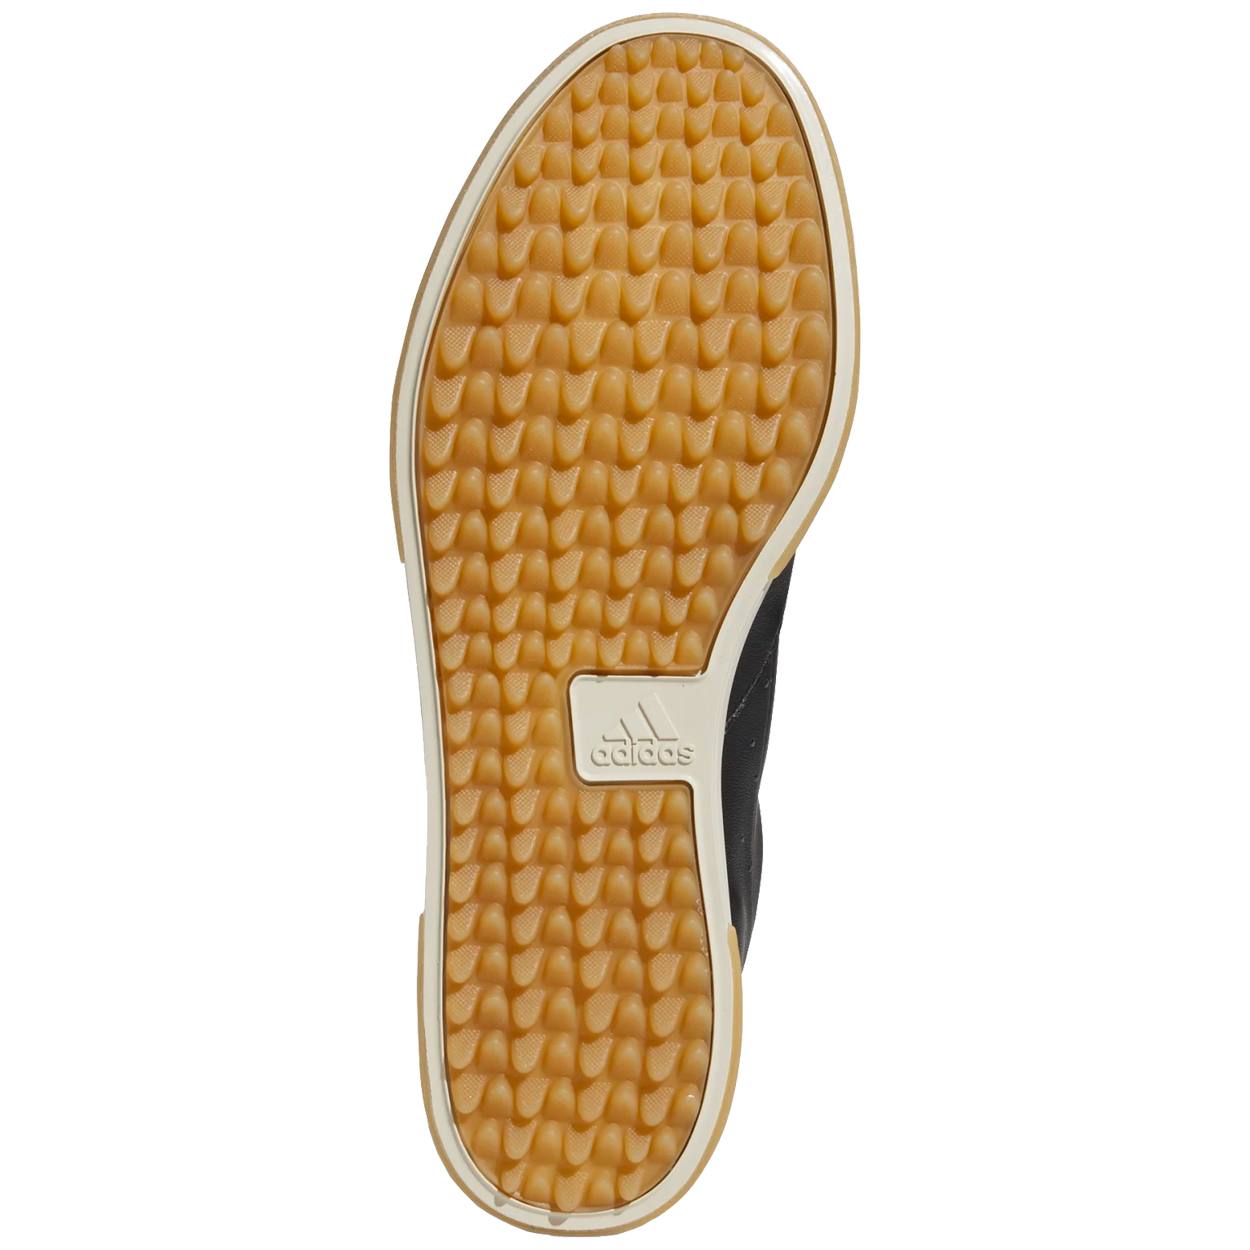 Adidas-Men-039-s-Adicross-Retro-Spikeless-Golf-Shoes-Brand-New thumbnail 5